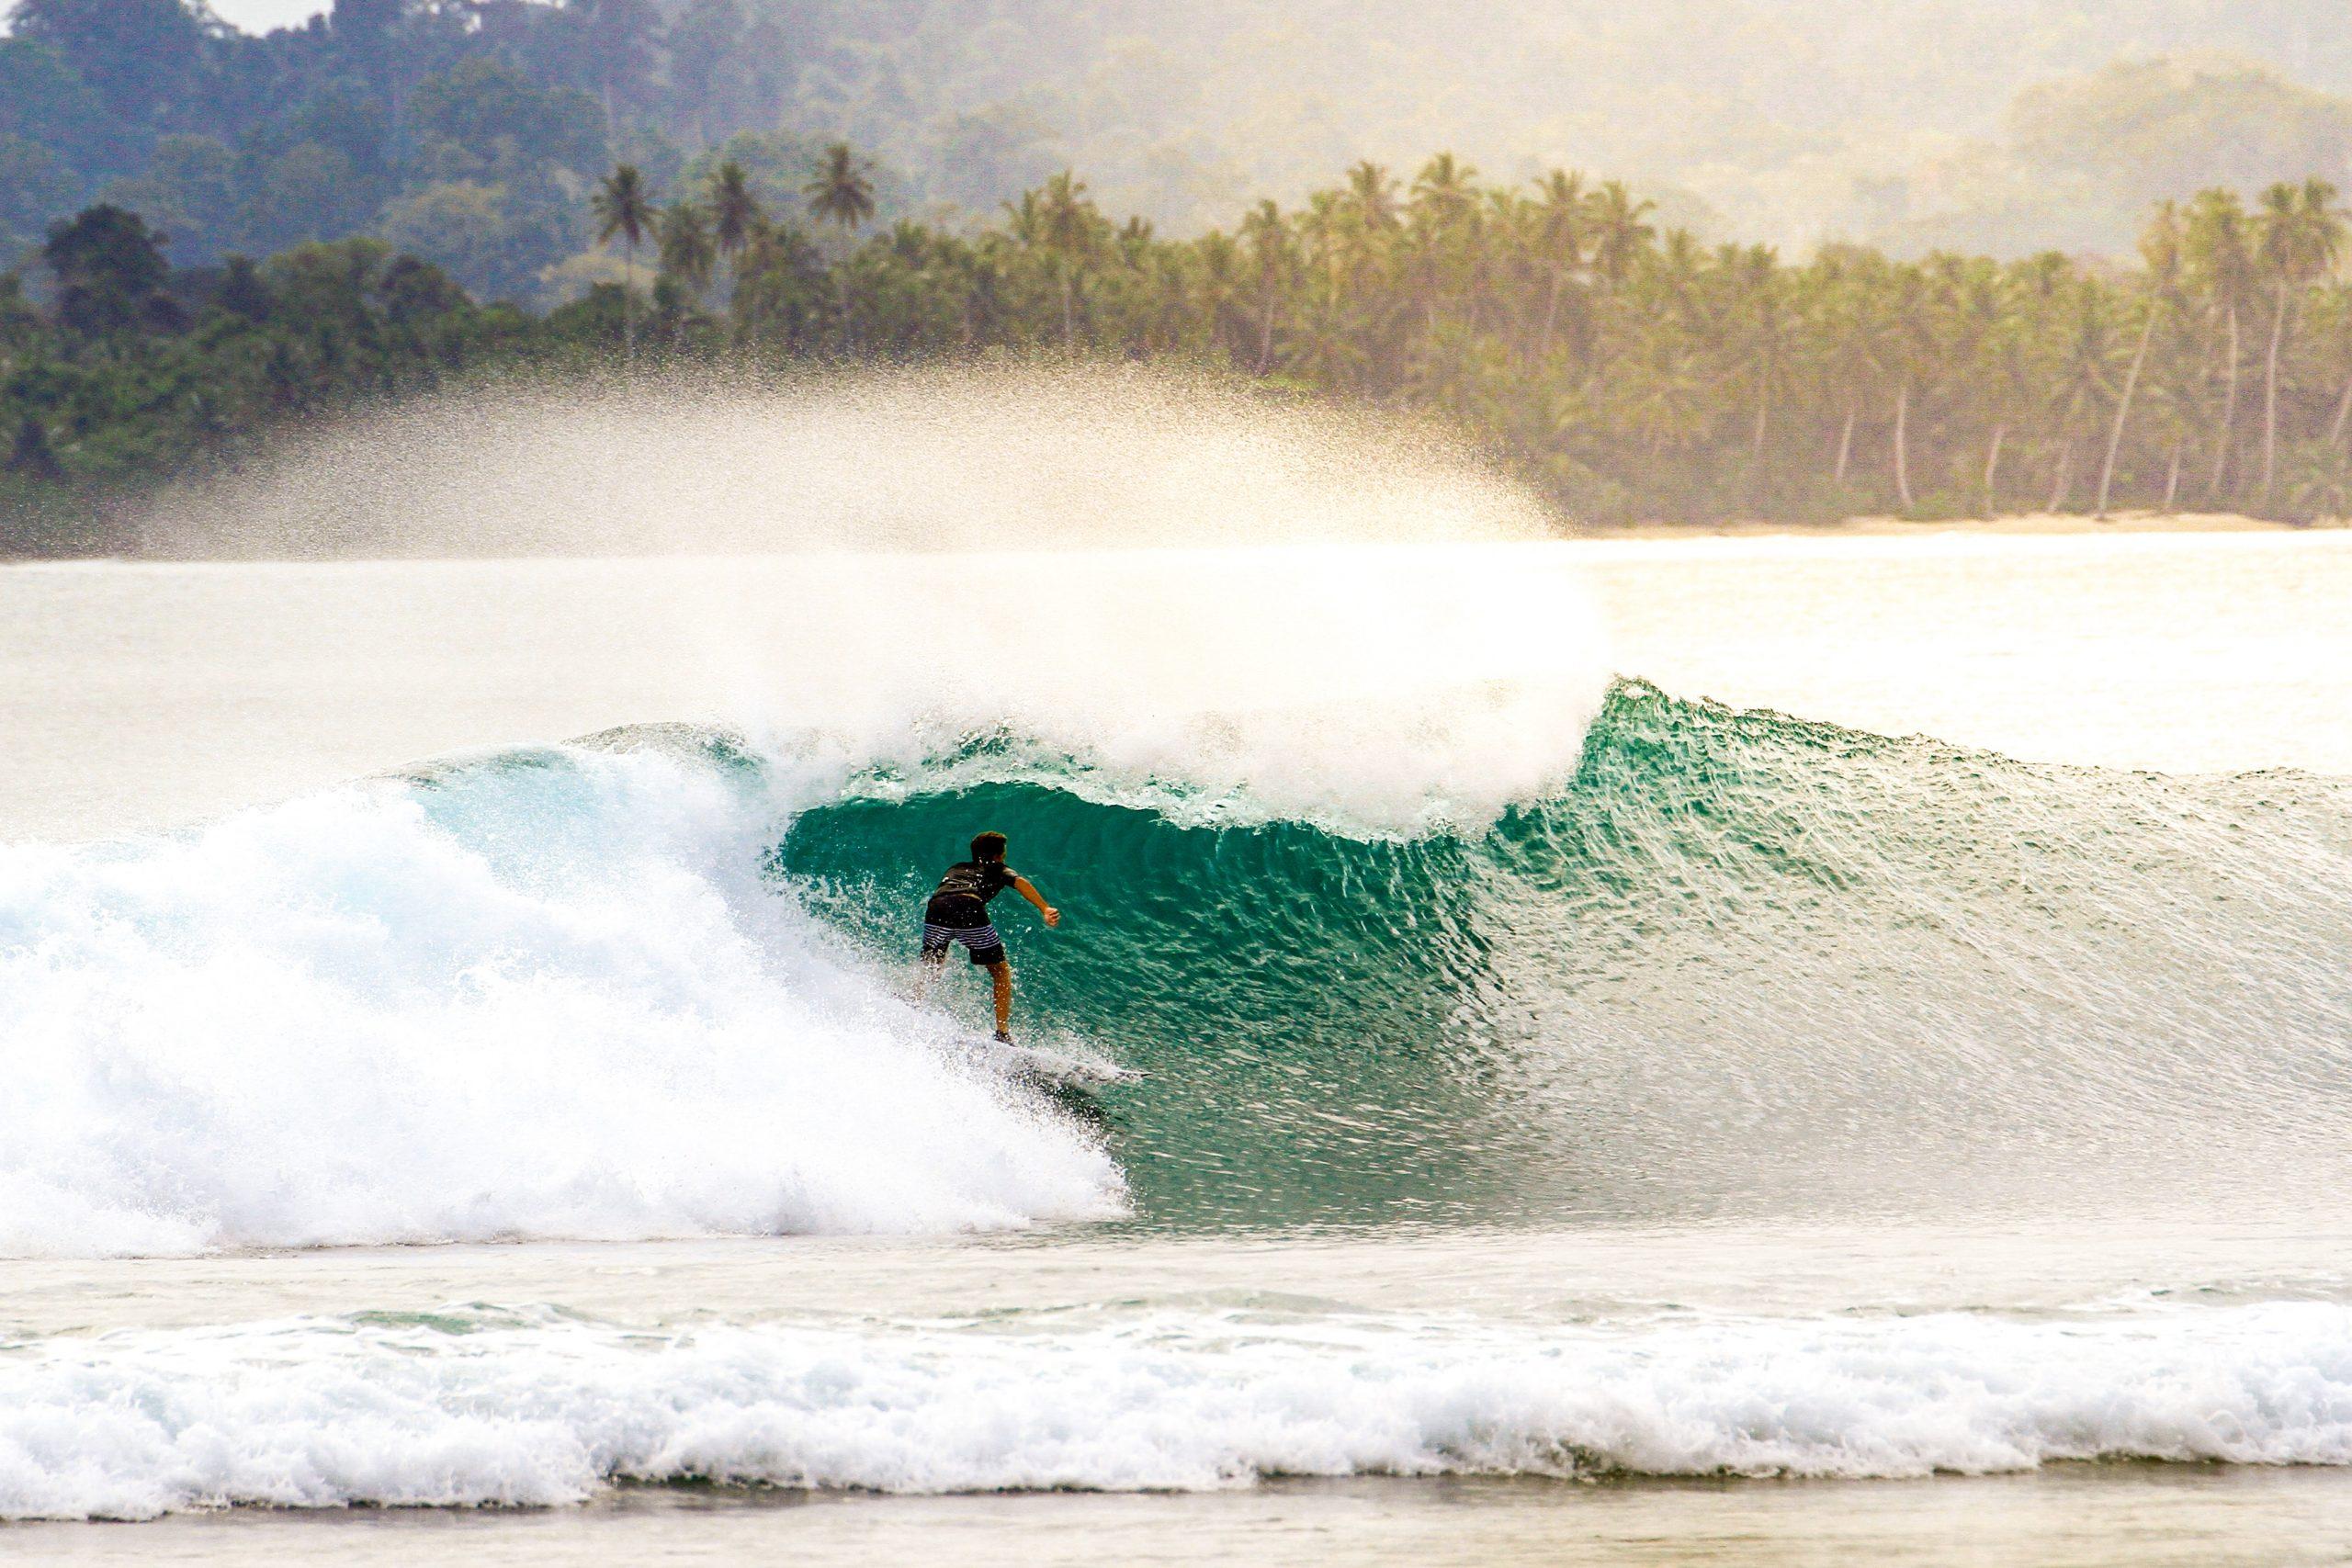 surf spots mentawai islands